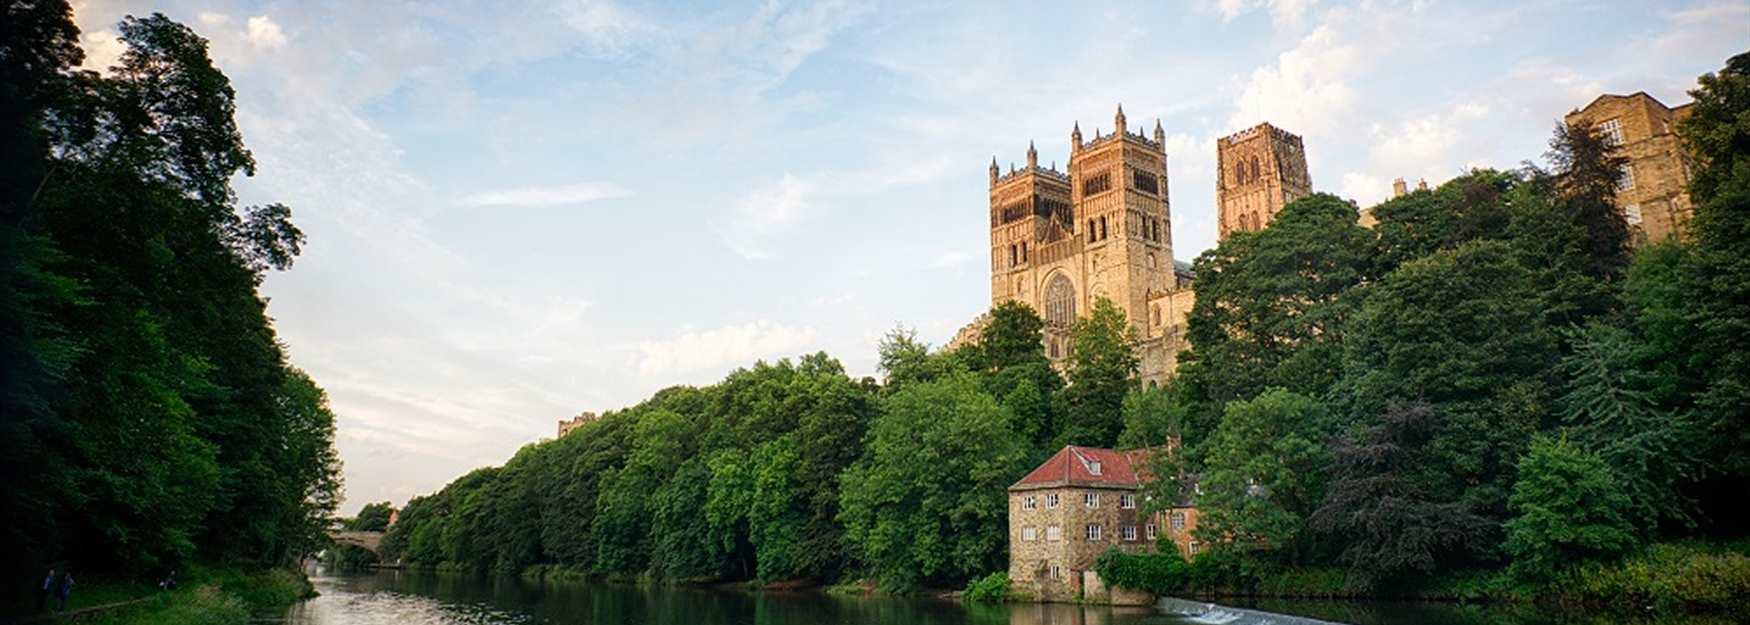 Riverside at Durham Cathedral